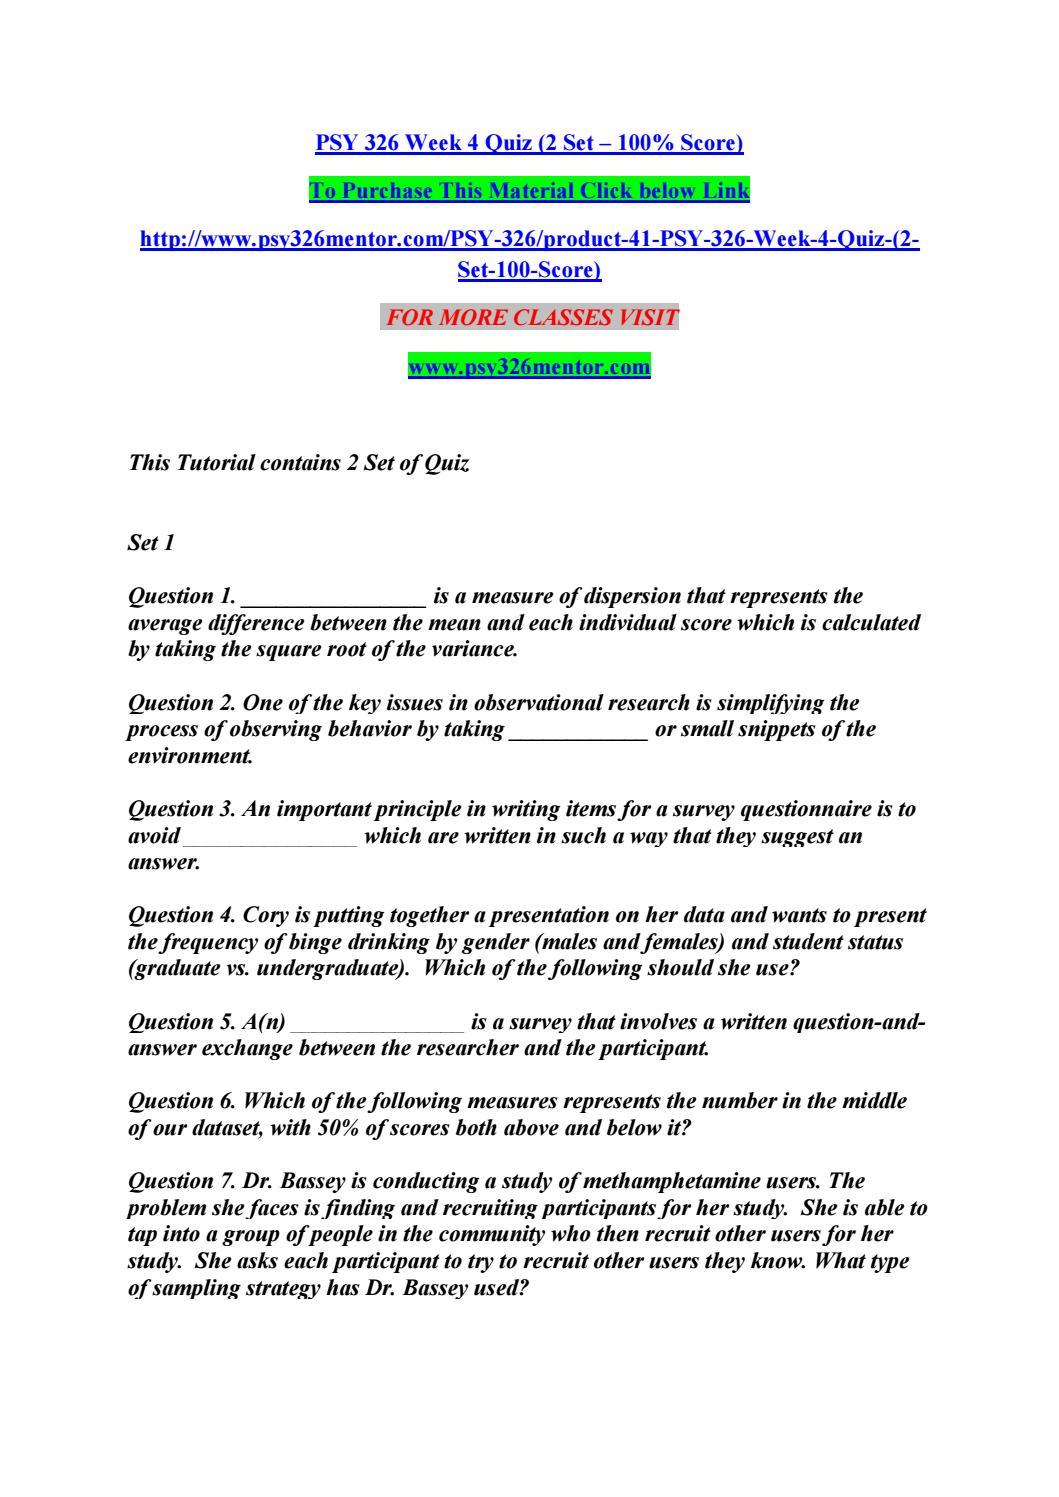 Quiz 2 psy - Essay Sample - August 2019 - 1146 words